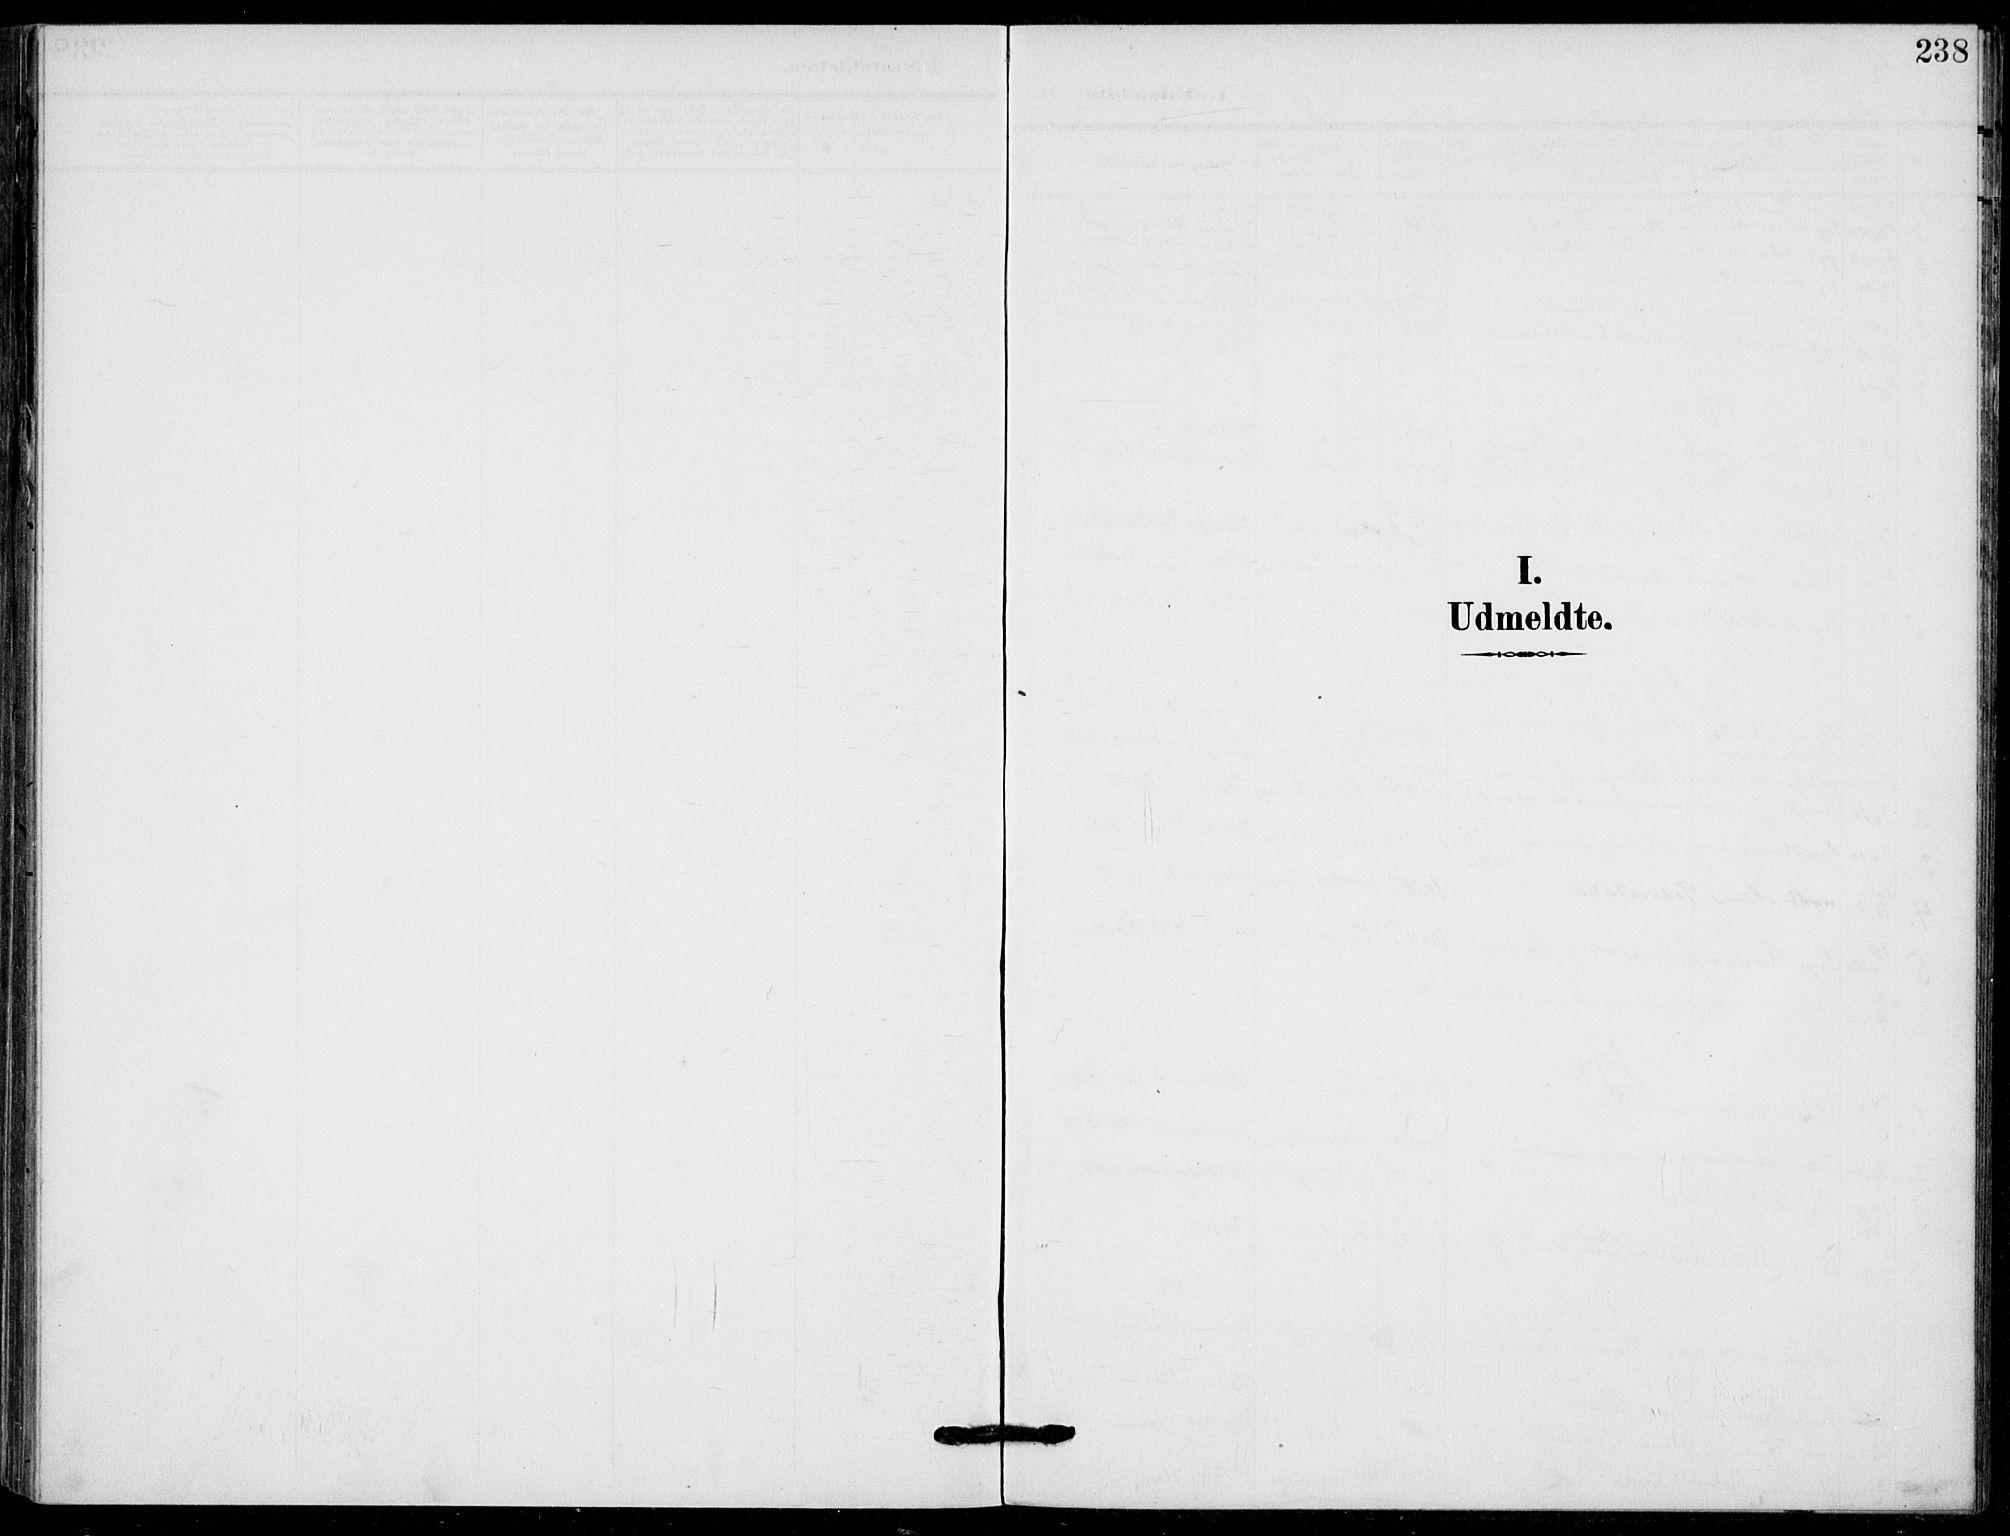 SAKO, Holla kirkebøker, F/Fa/L0012: Ministerialbok nr. 12, 1907-1923, s. 238